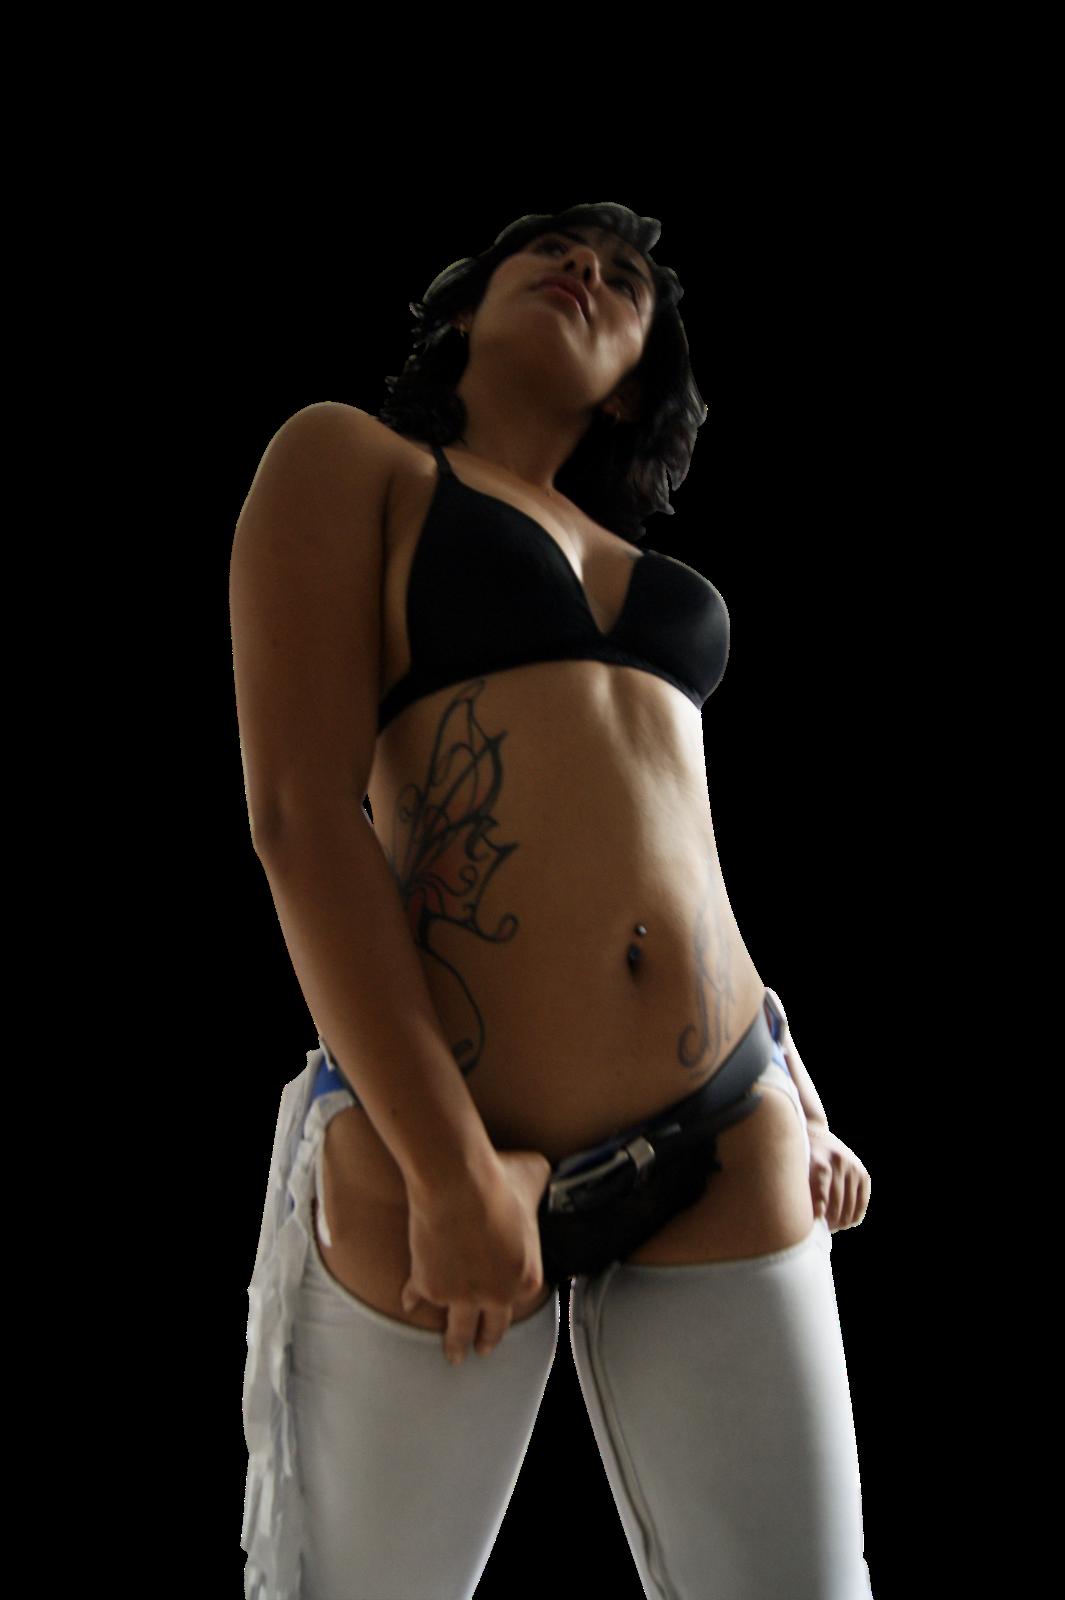 Esposa stripper mujer austin